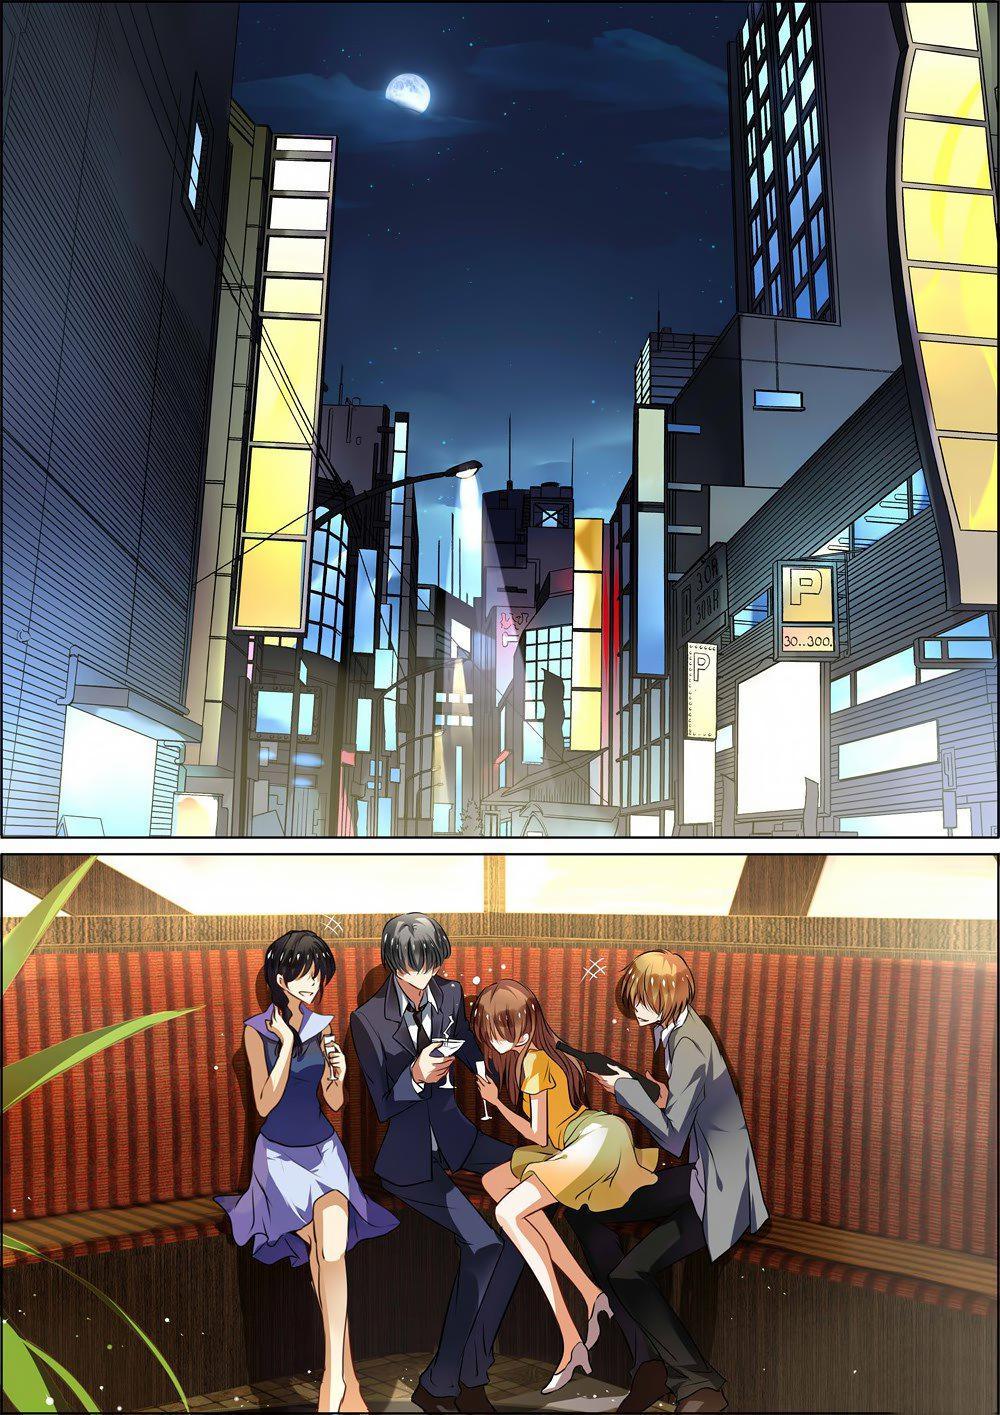 http://c5.ninemanga.com/es_manga/5/16069/385053/352decc1e8f3d97fcdb53af60cbe1f53.jpg Page 3